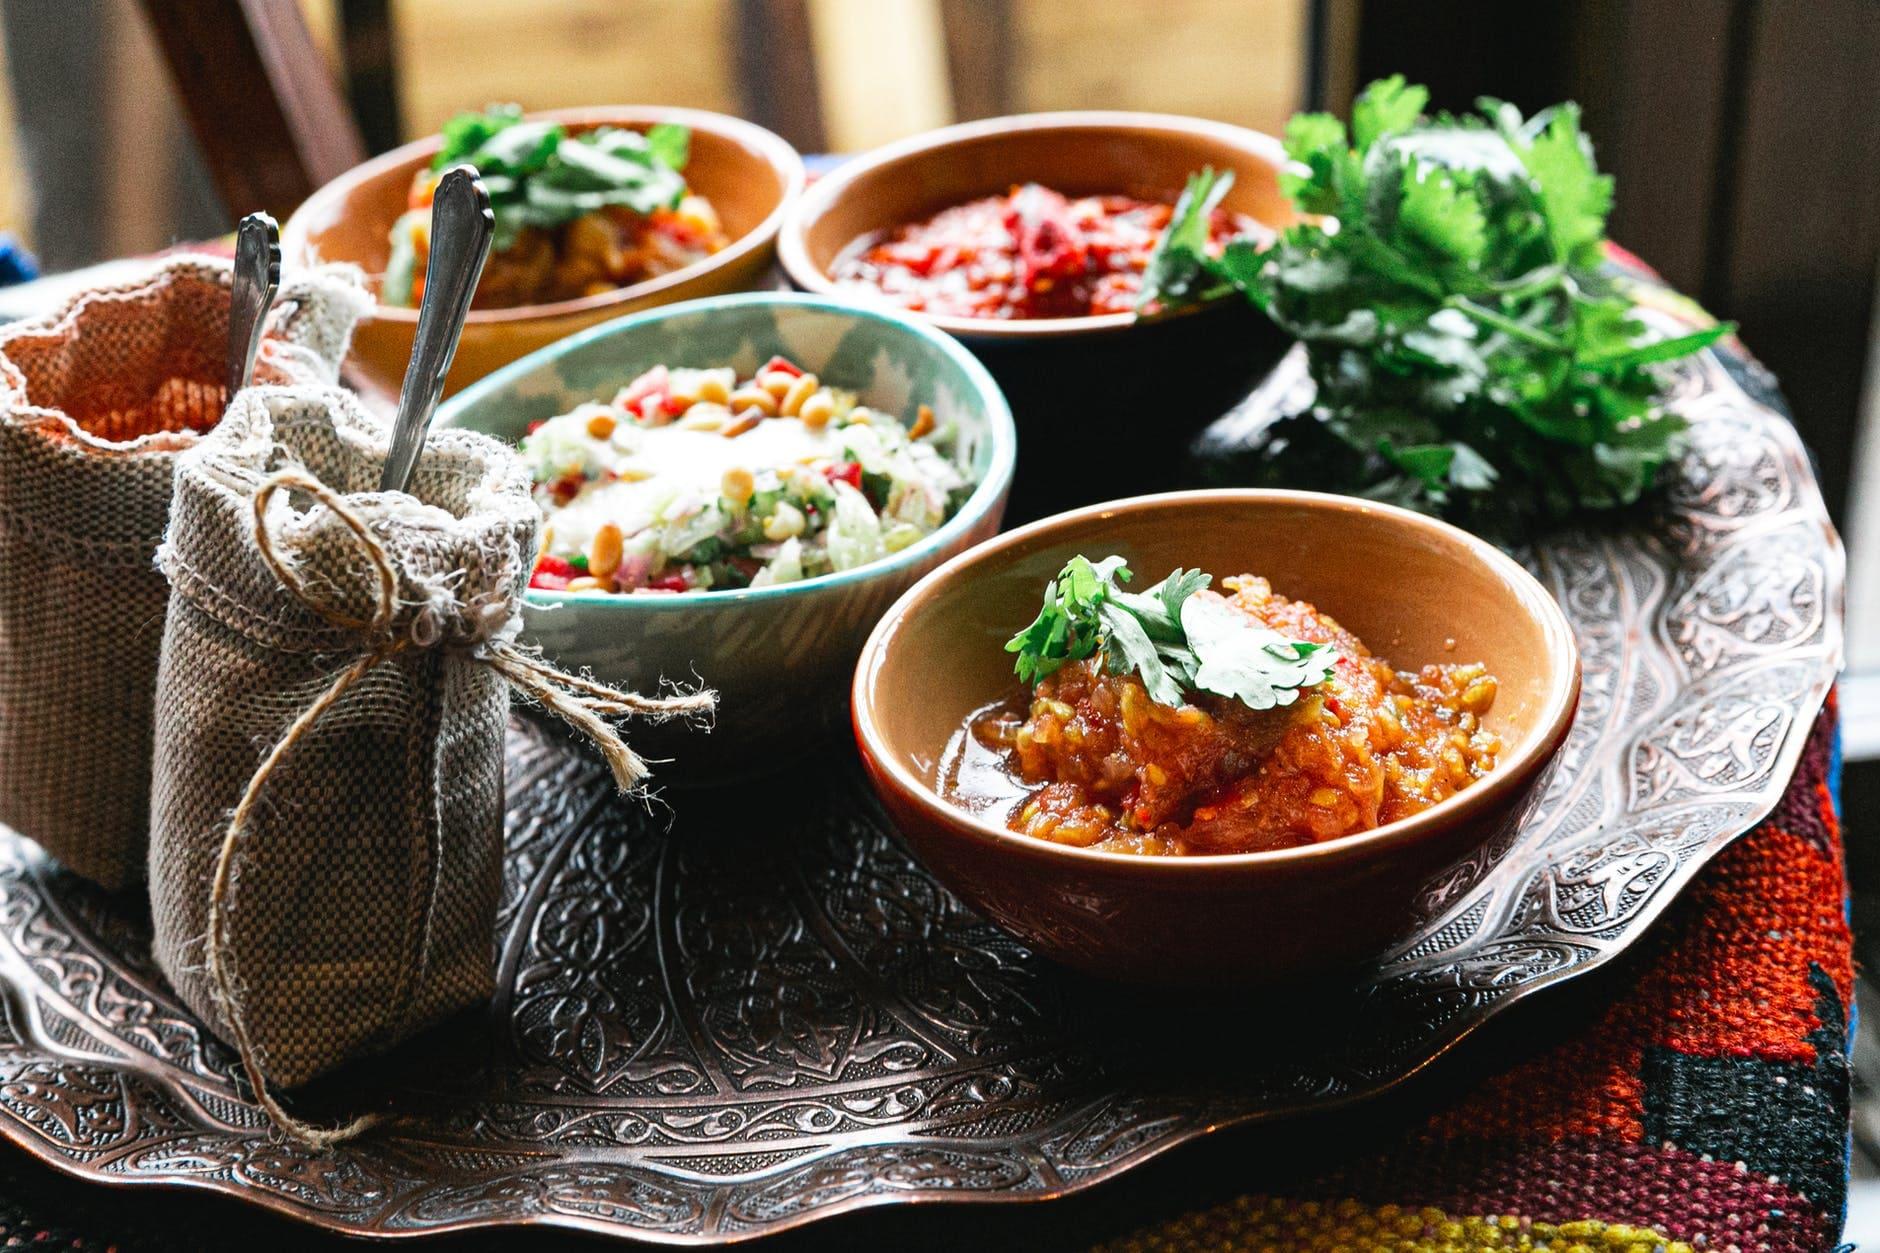 How to make a Turkish potato salad